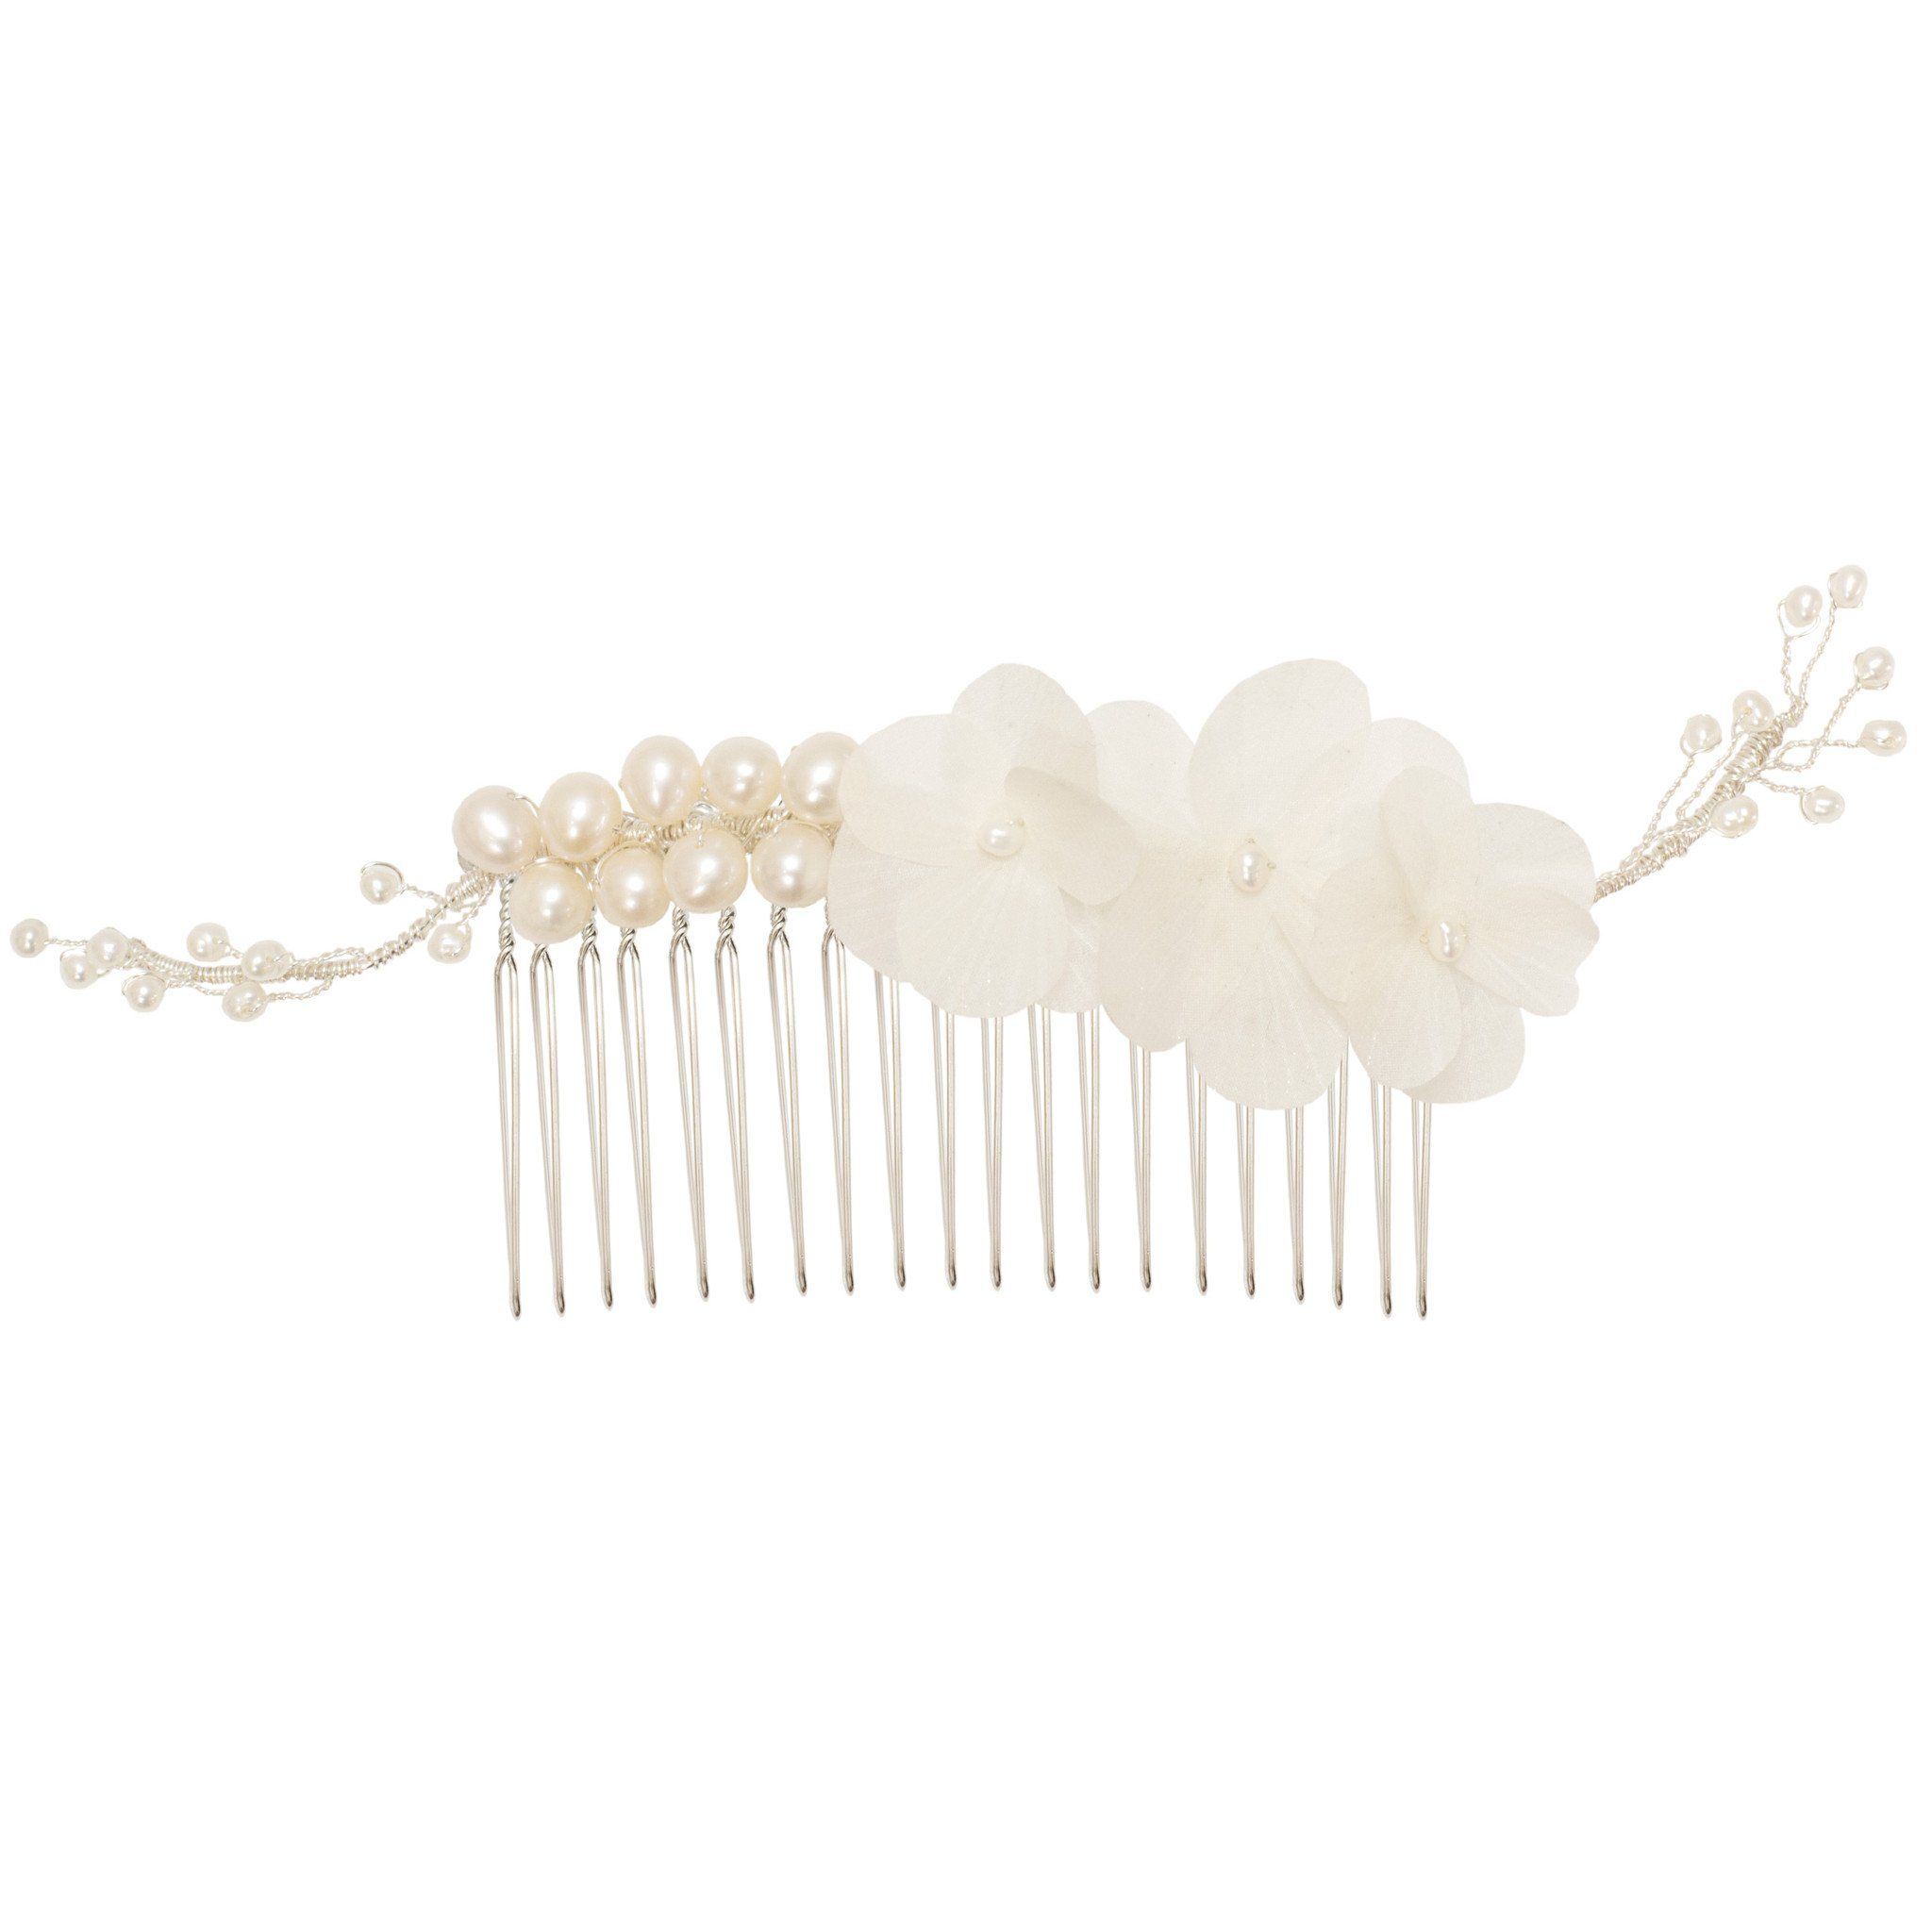 Silk Flower Silver Comb For A Bride Helvia Britten Weddings